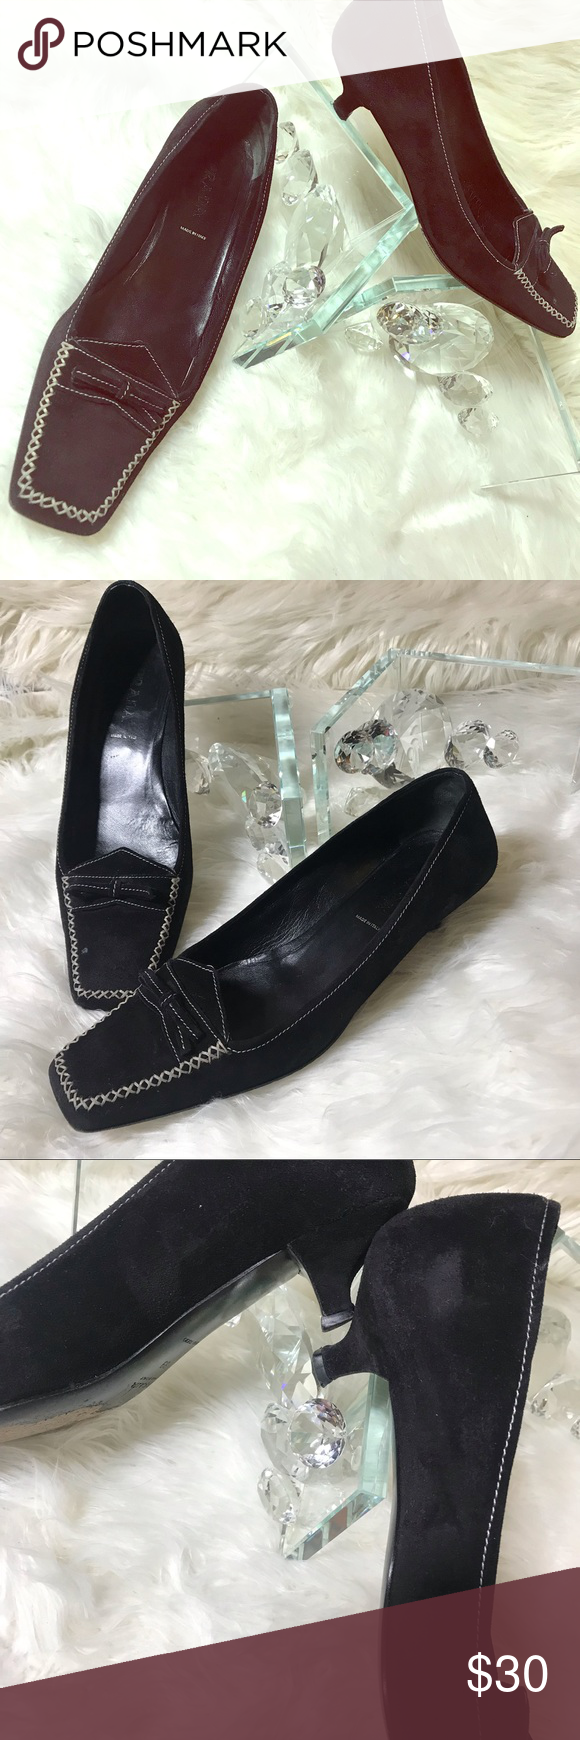 df902ef9dbab4 Prada kitten heels 39 size Prada kitten heels 39 size gently used. See  photos. Prada Shoes Heels